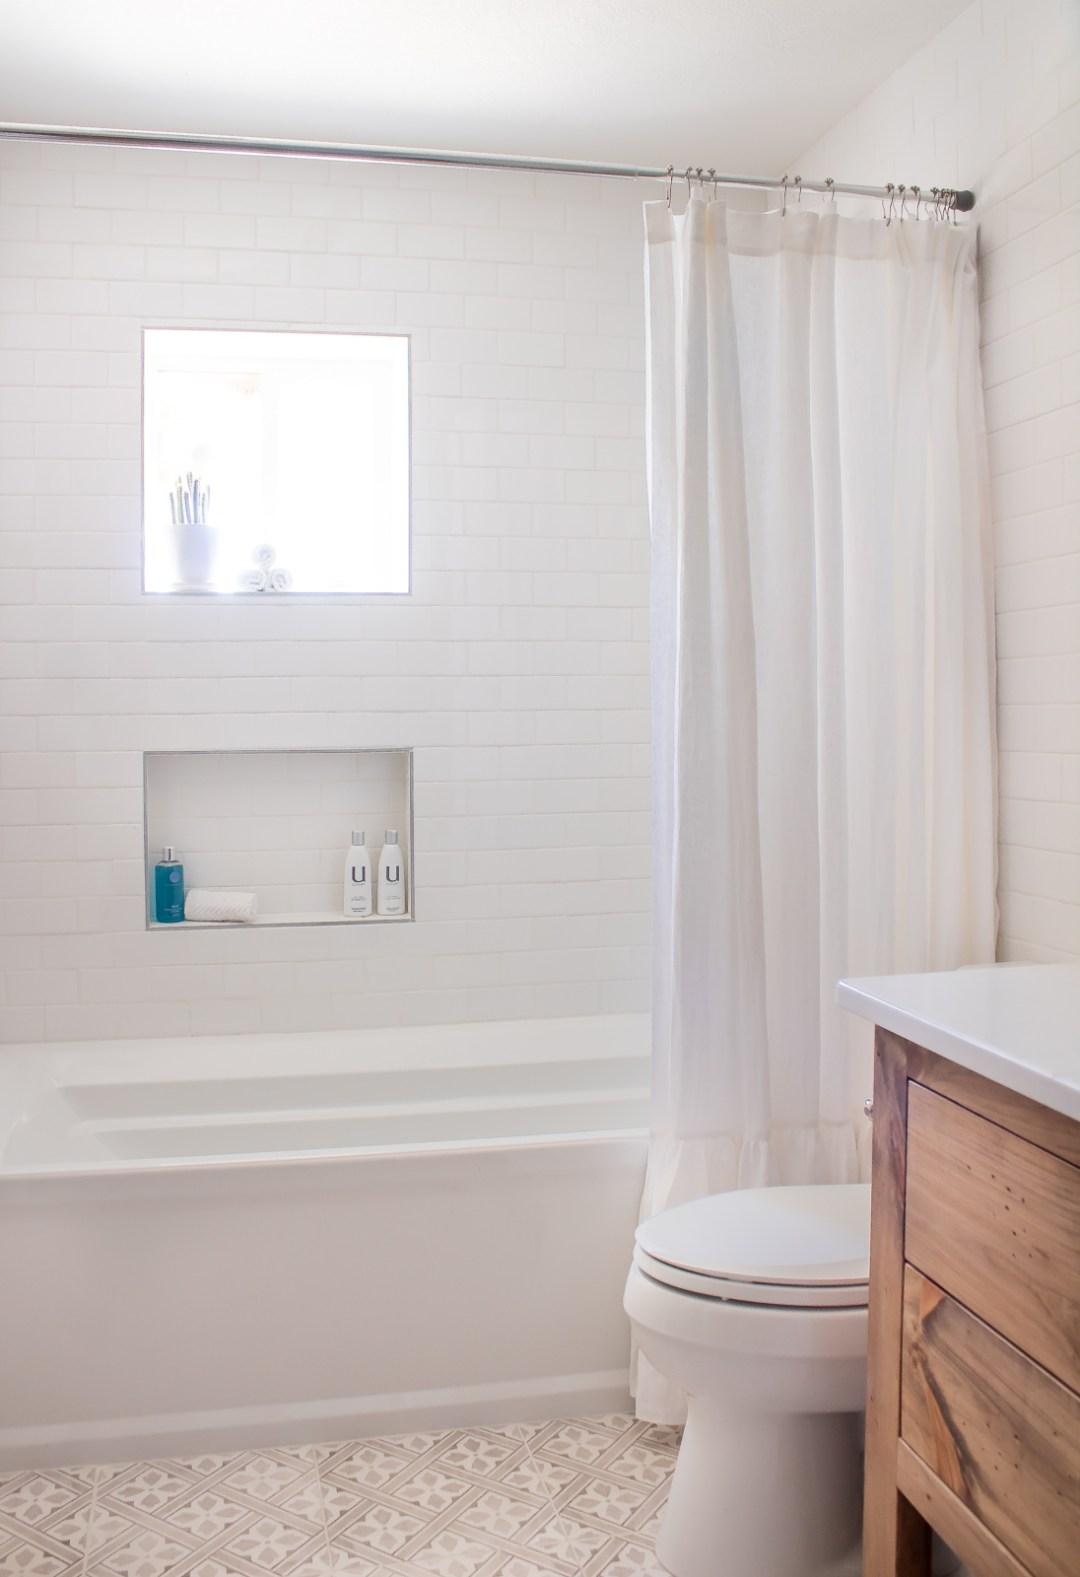 Bathtub niche ideas